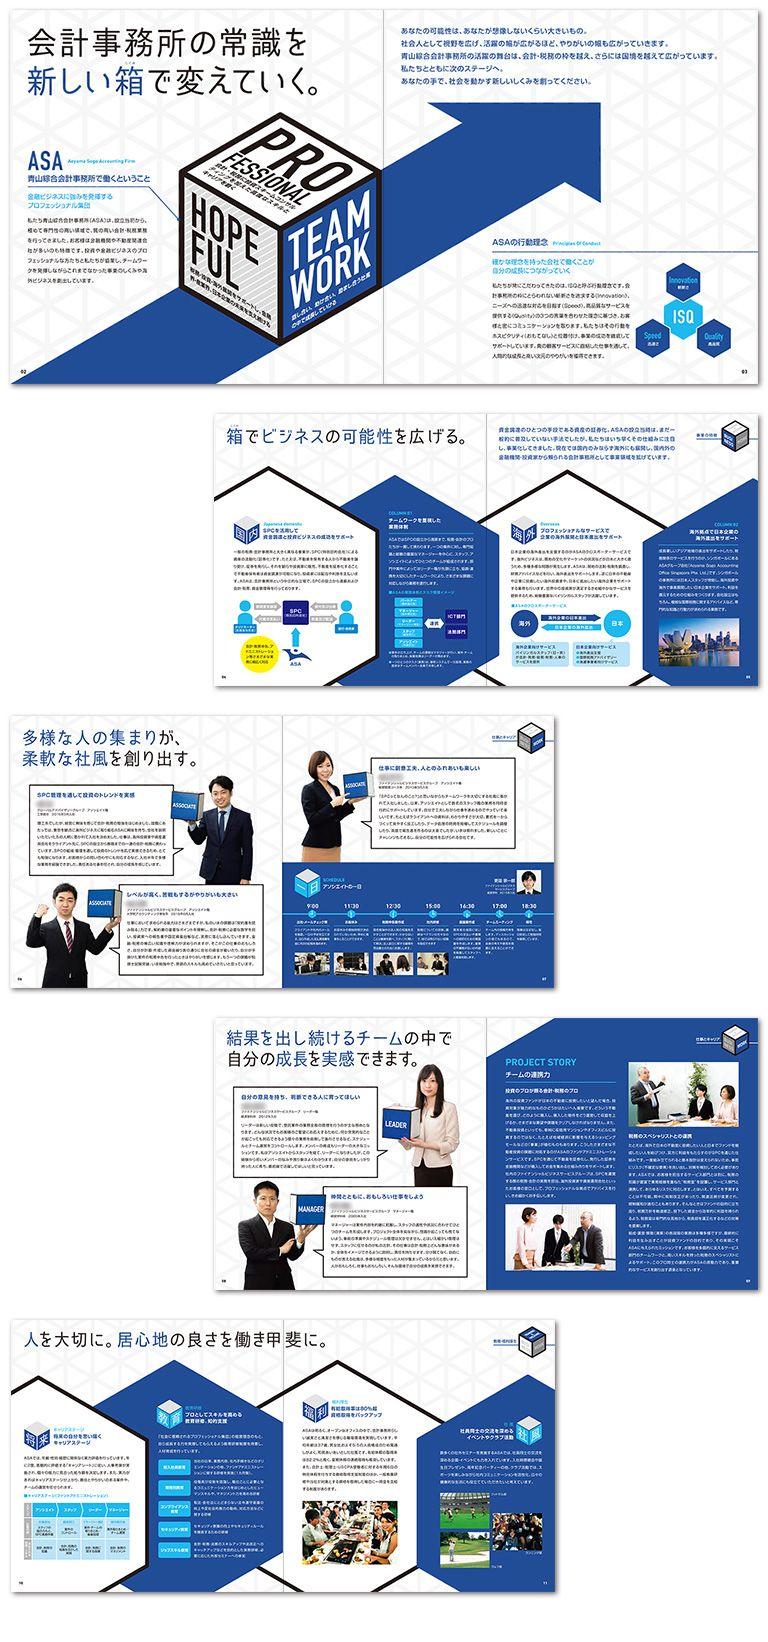 spc会計事務所の採用パンフレット作成実績 prints pinterest